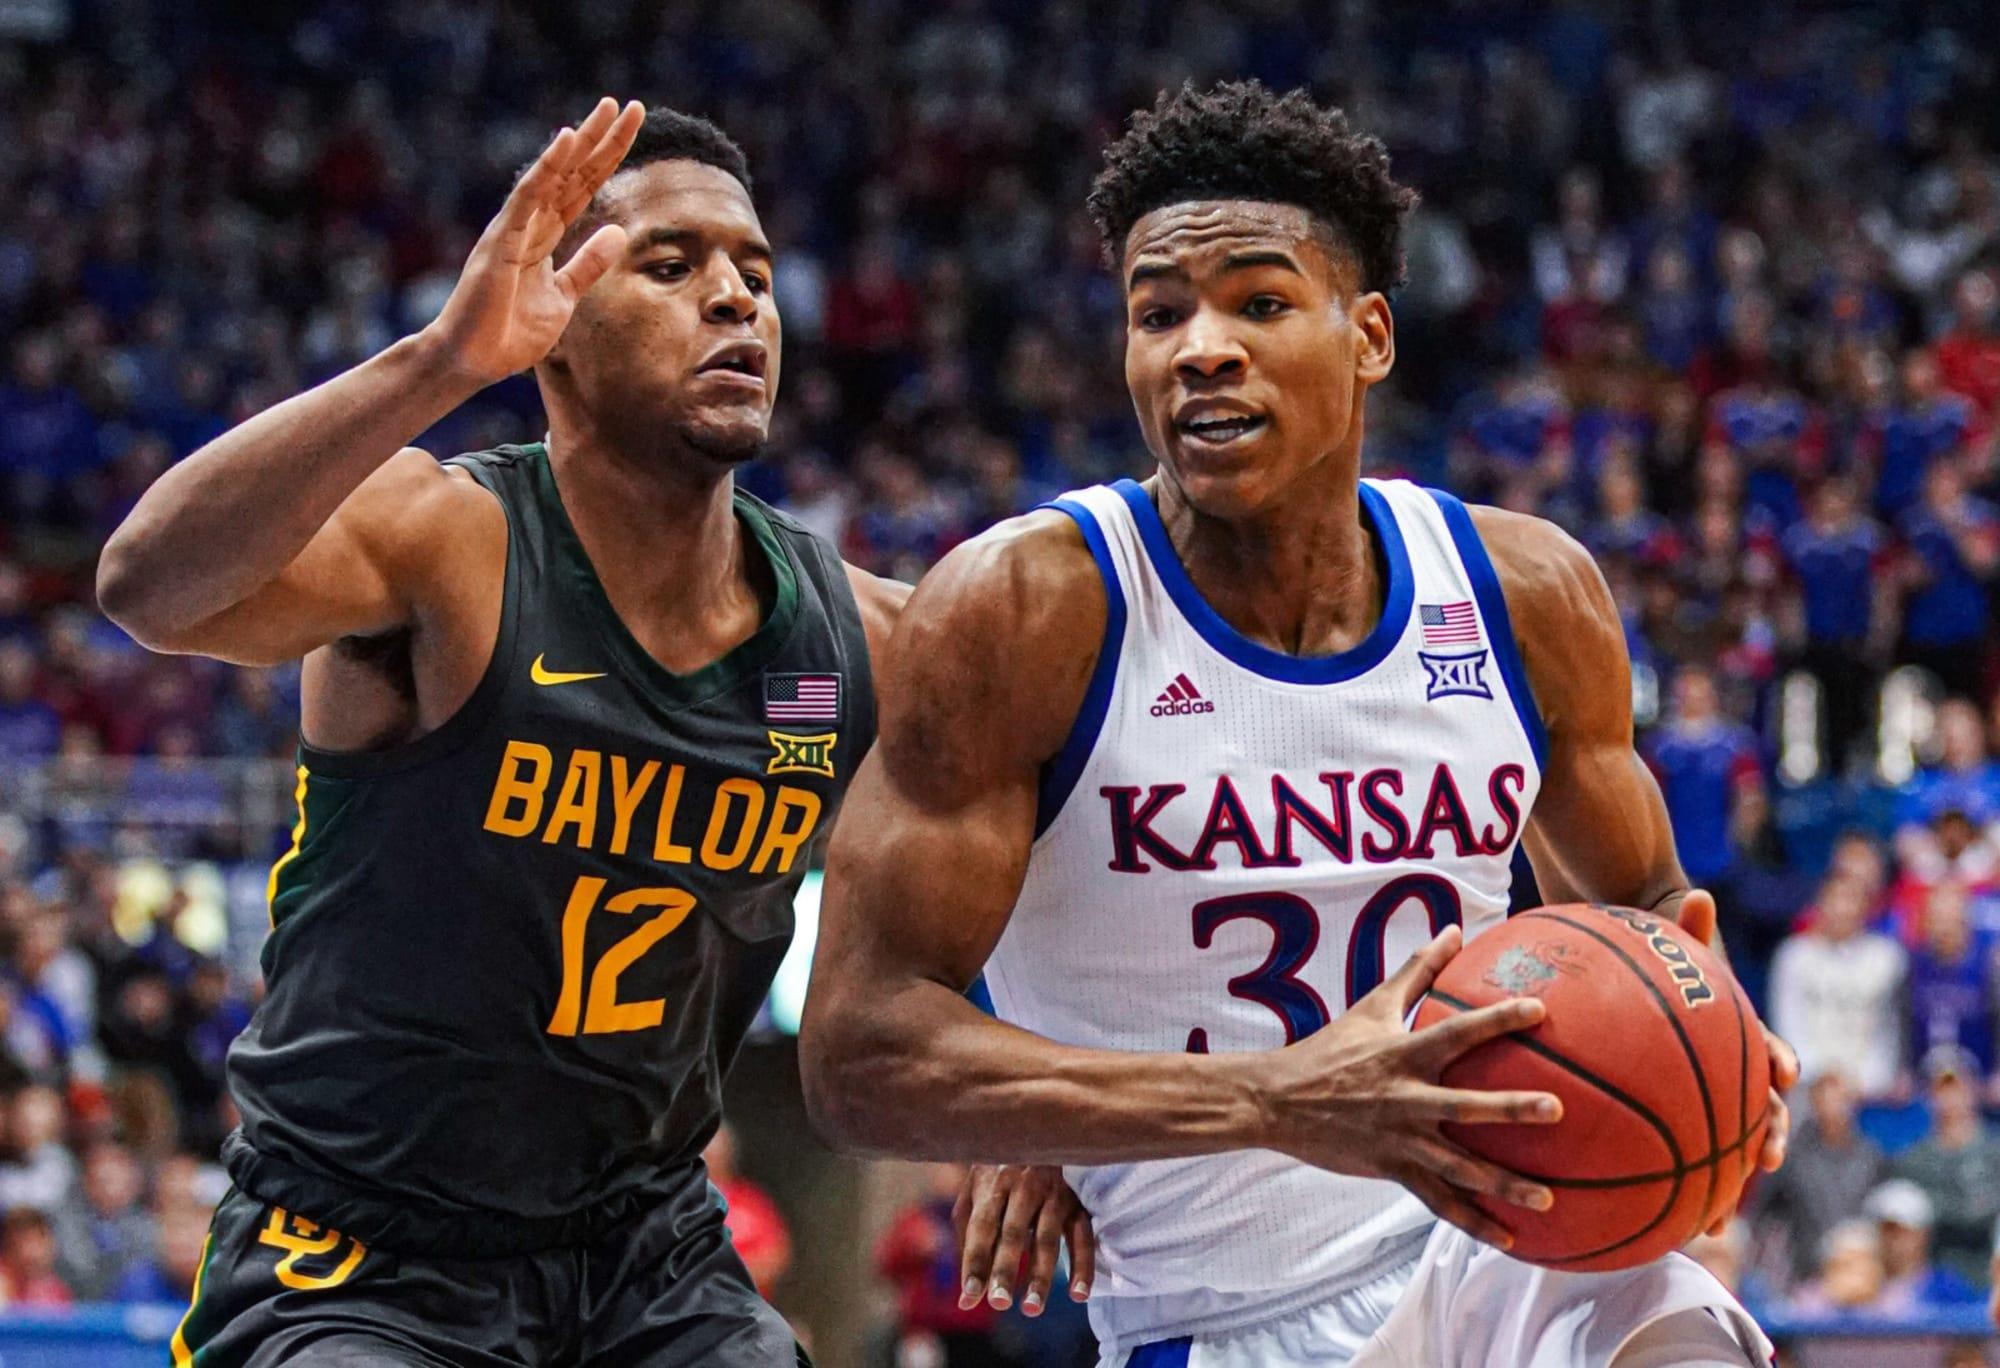 Kansas vs. Baylor: 2020-21 college basketball game preview, TV schedule